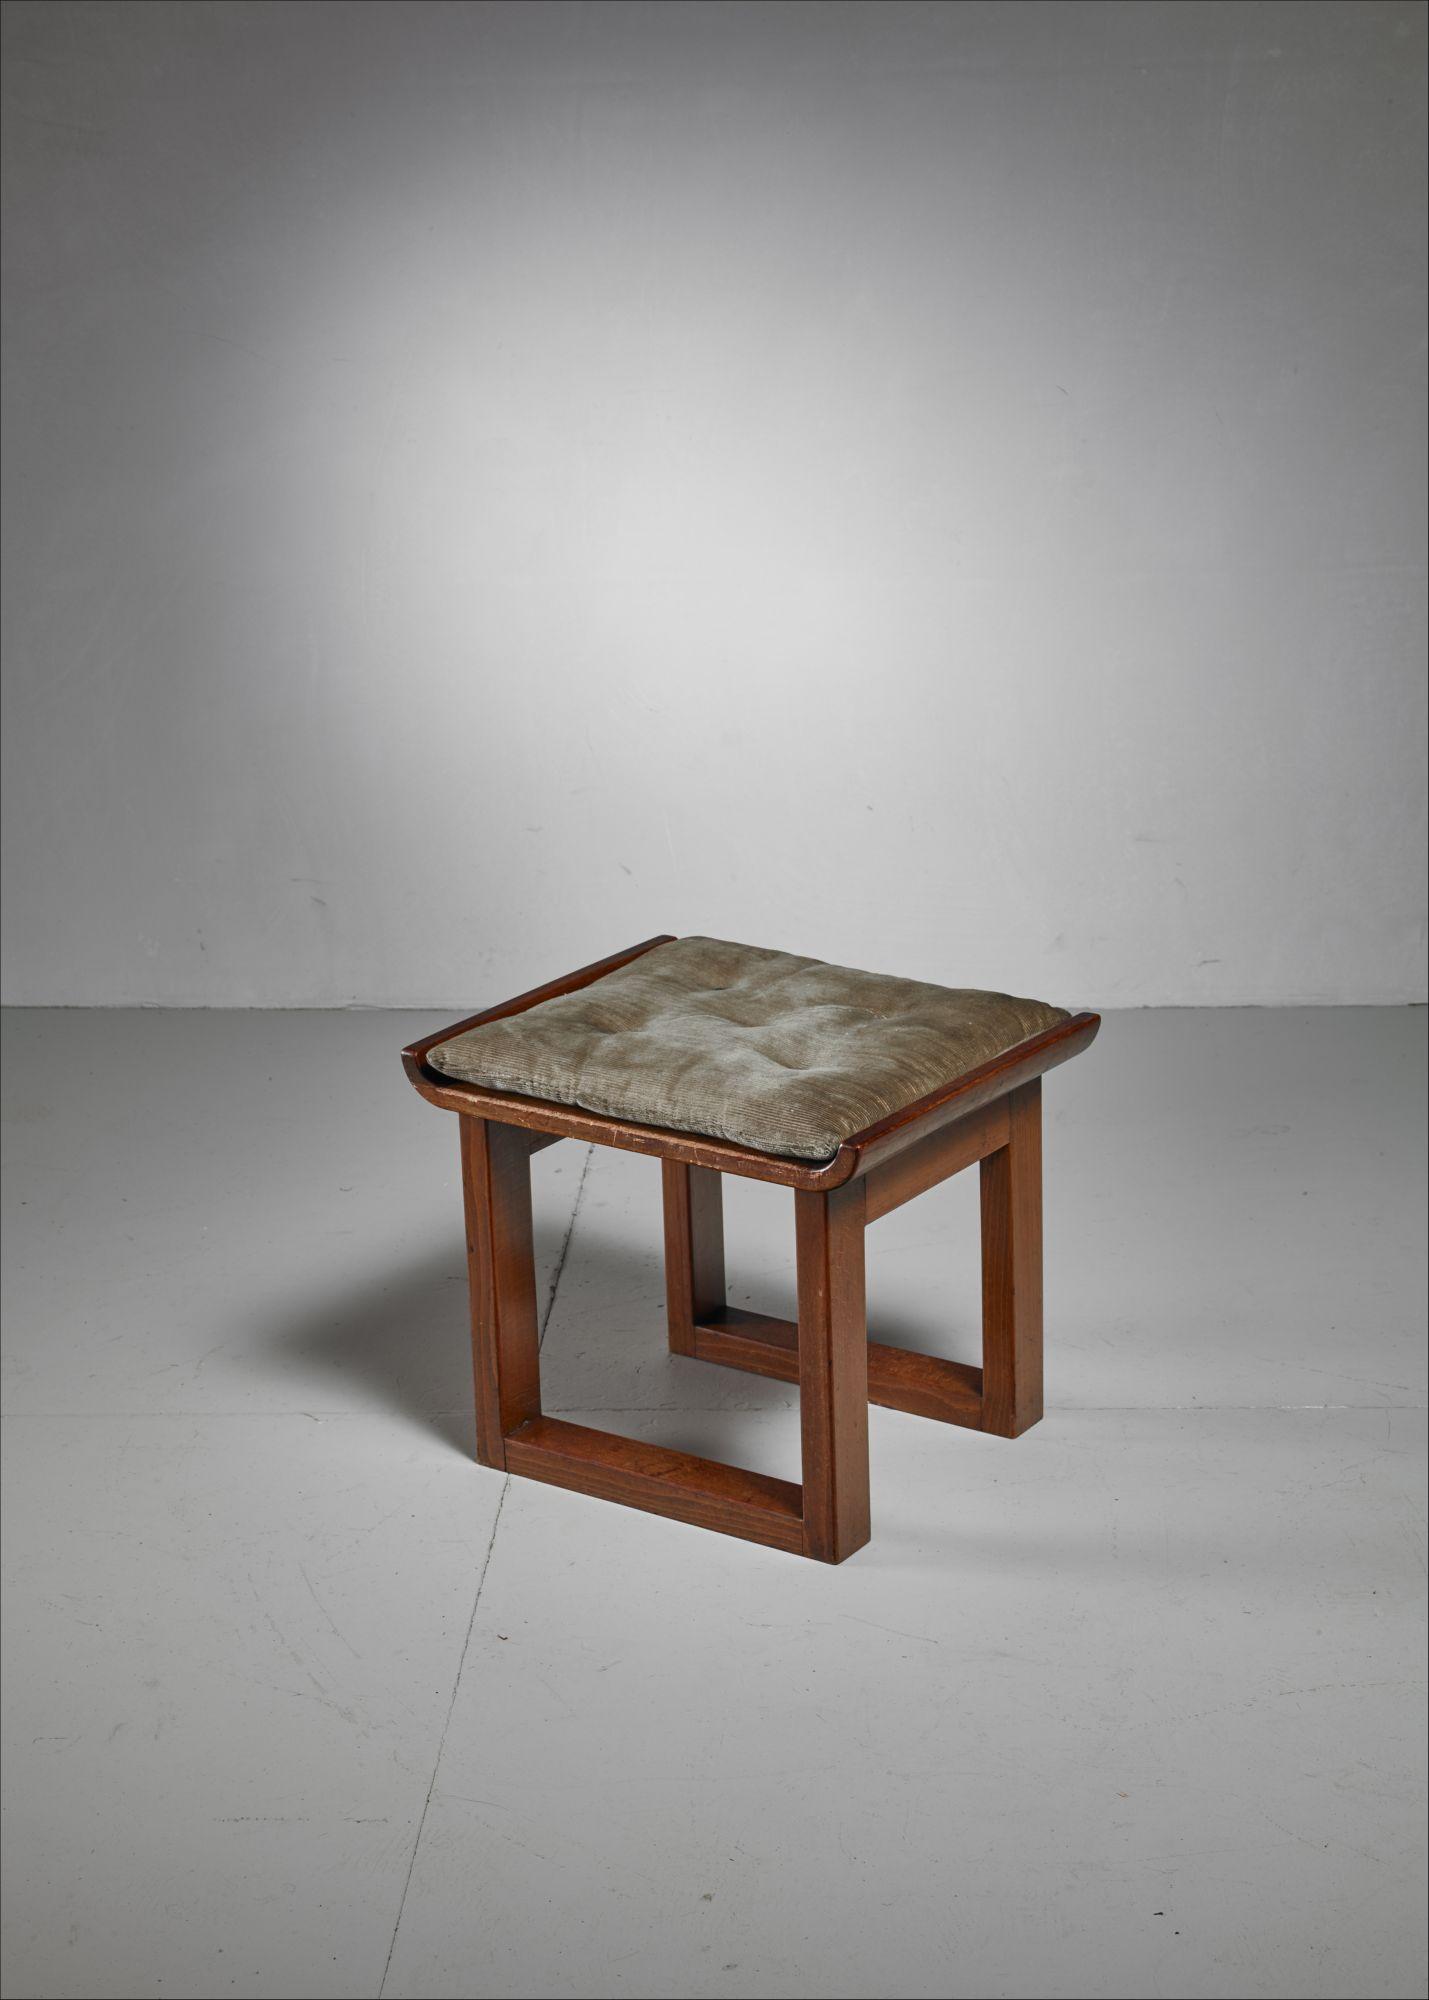 Danish stool or ottoman with cushion 1930s